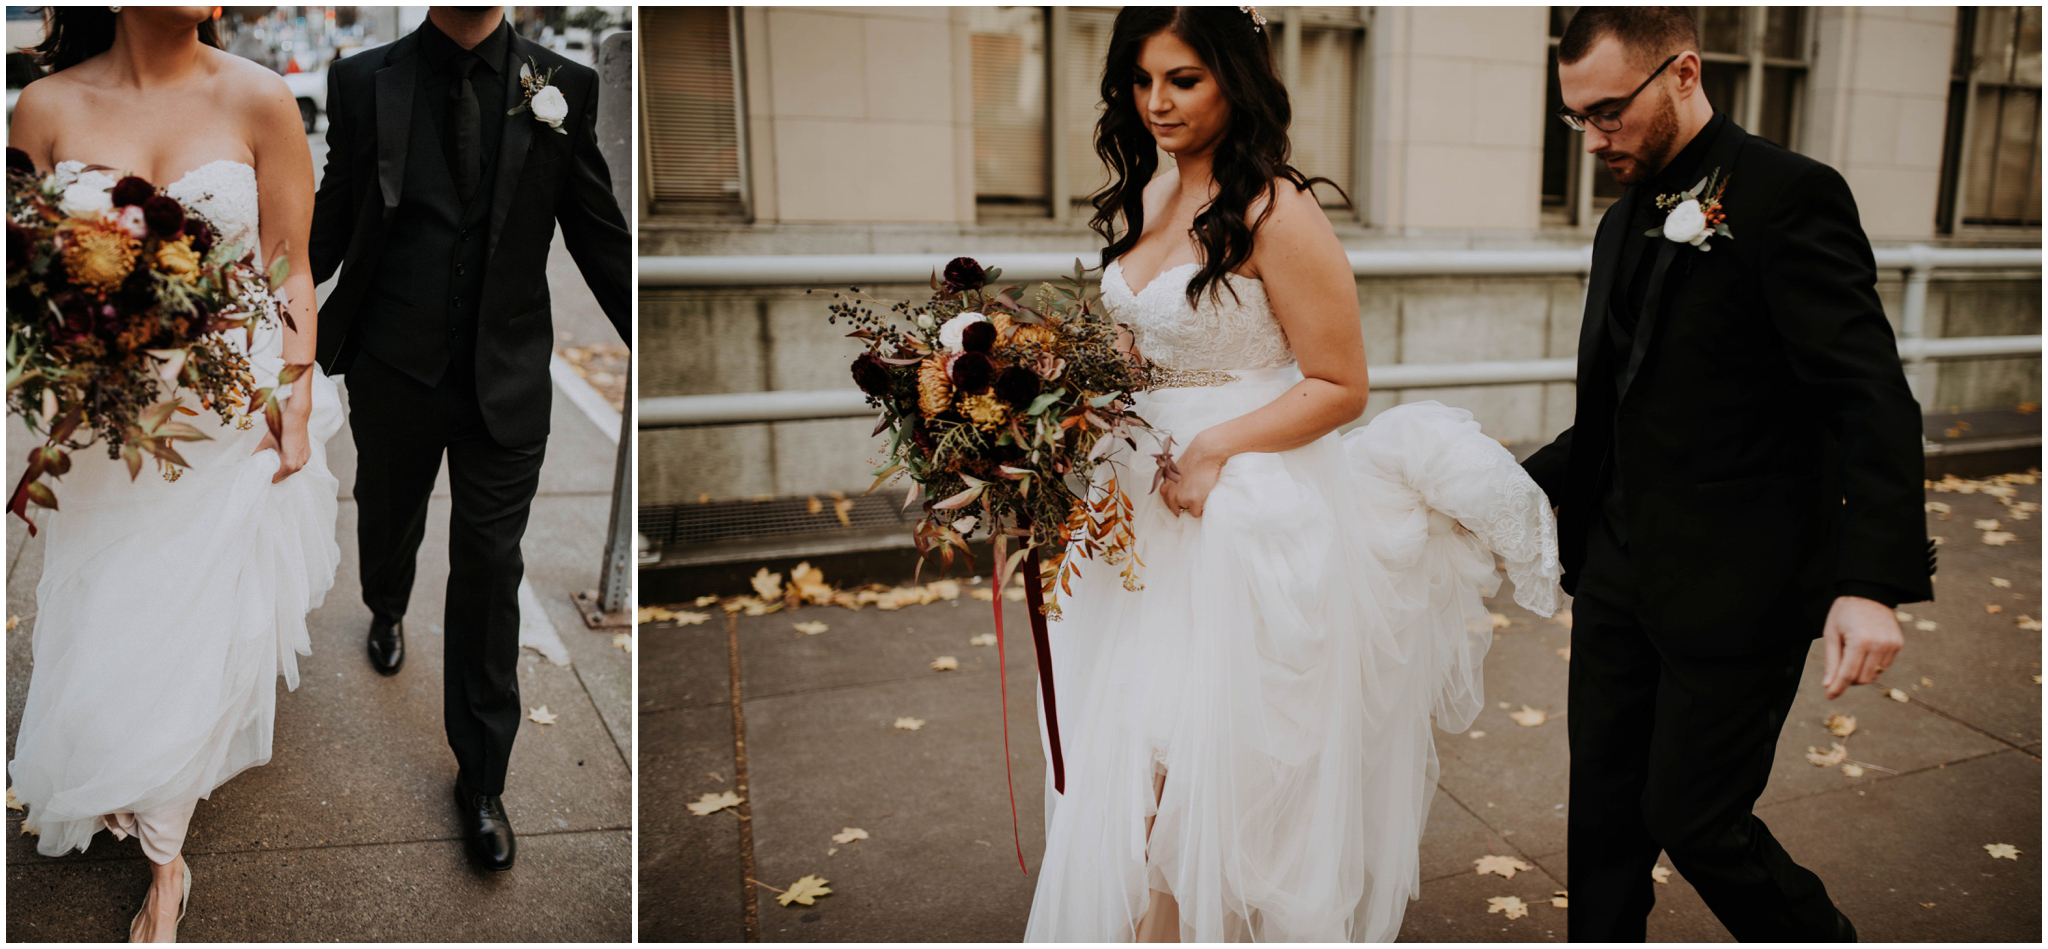 danny+mackenzie+downtown-seattle-axis-wedding-seattle-photographer-038.jpg